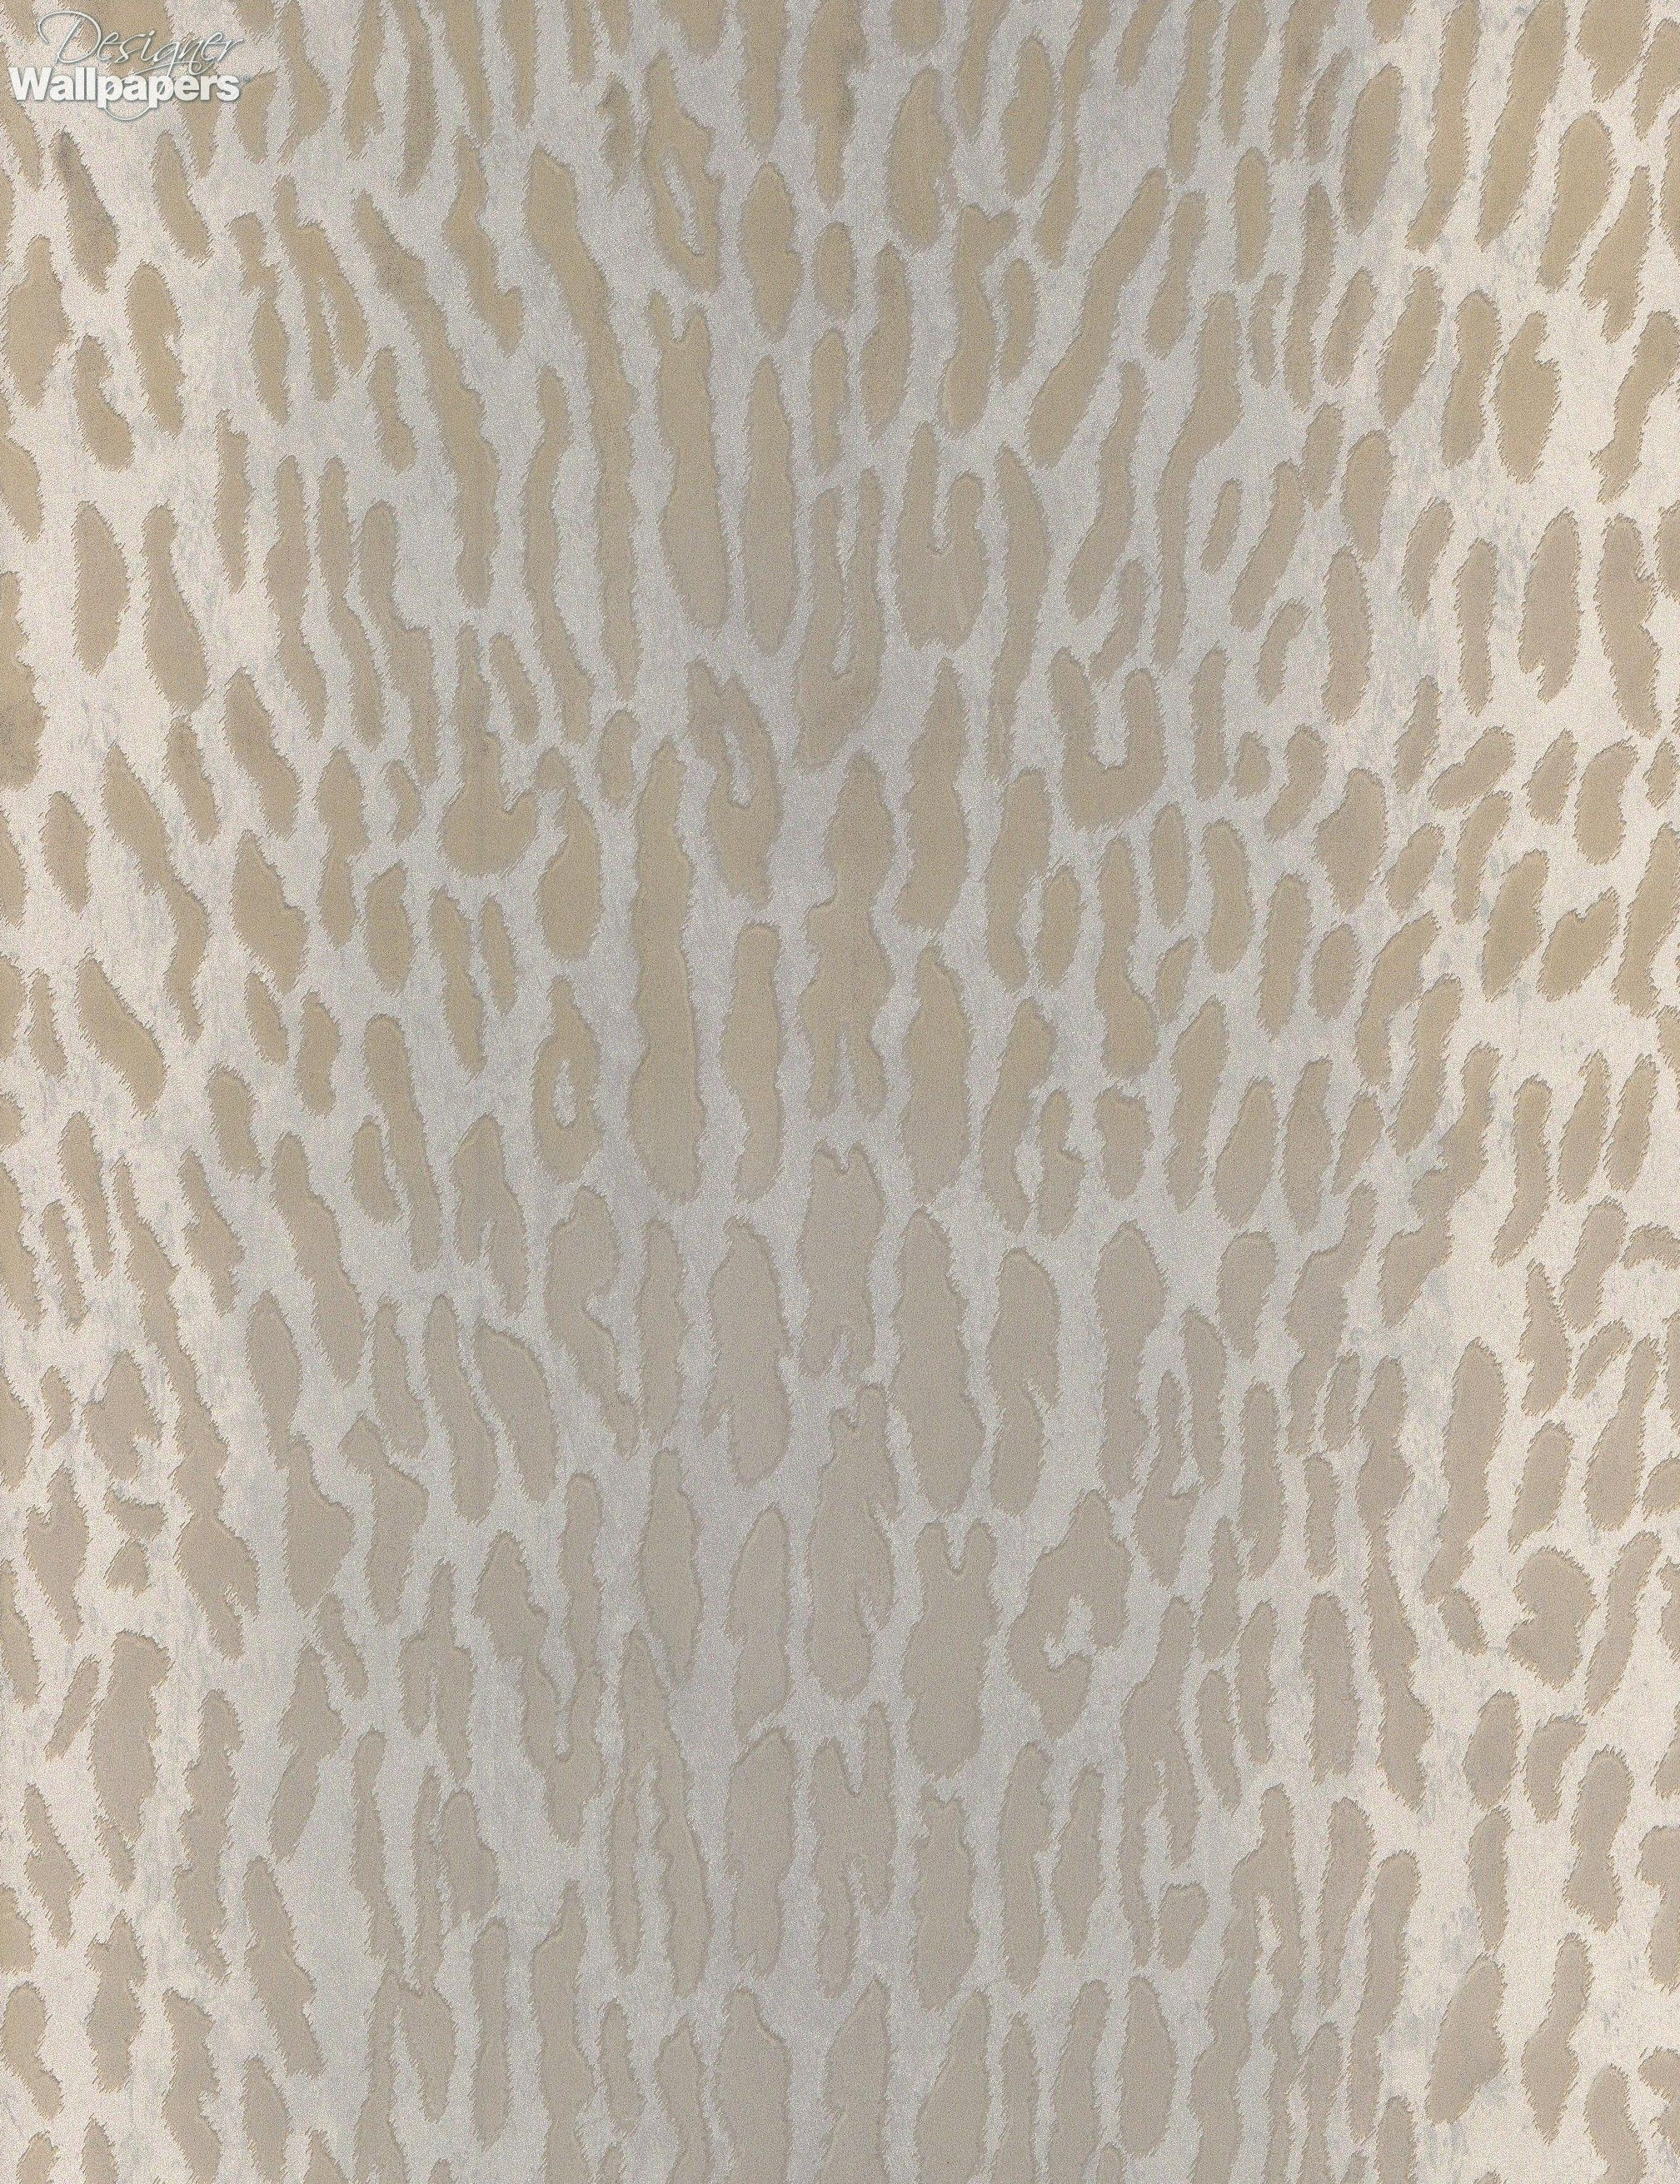 ombre leopard wallpaper - photo #16